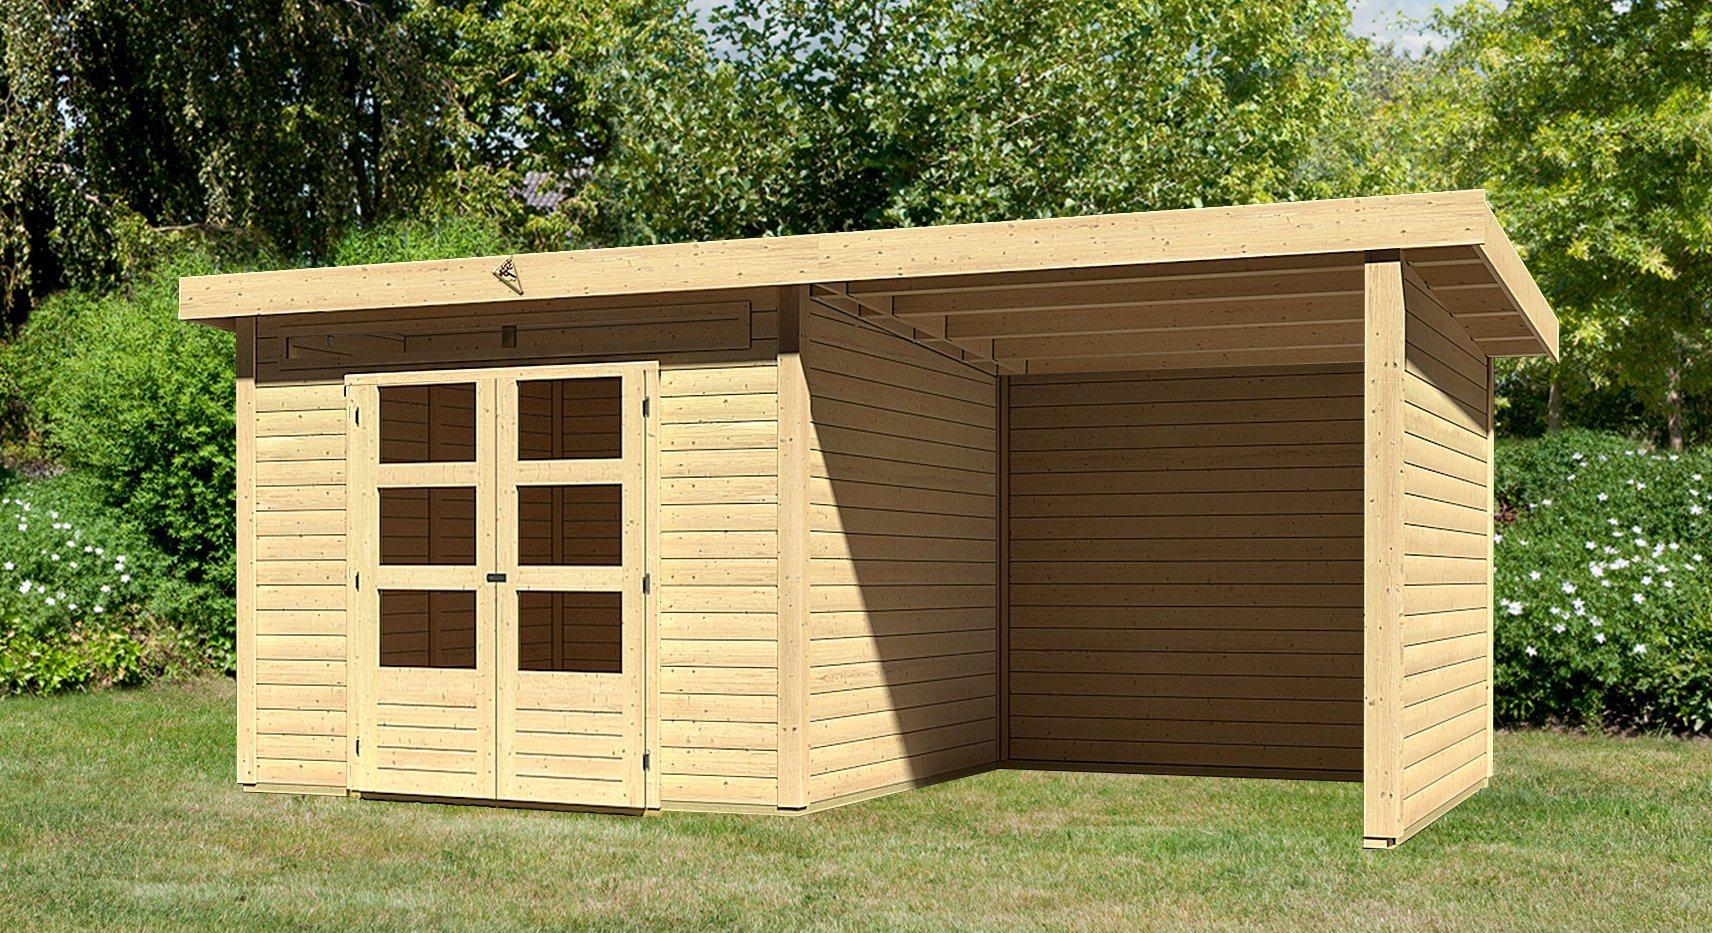 KARIBU Gartenhaus »Kandern 6«, Gesamtmaß (BxT): 612x303 cm, mit Anbaudach | Garten > Gartenhäuser | Karibu